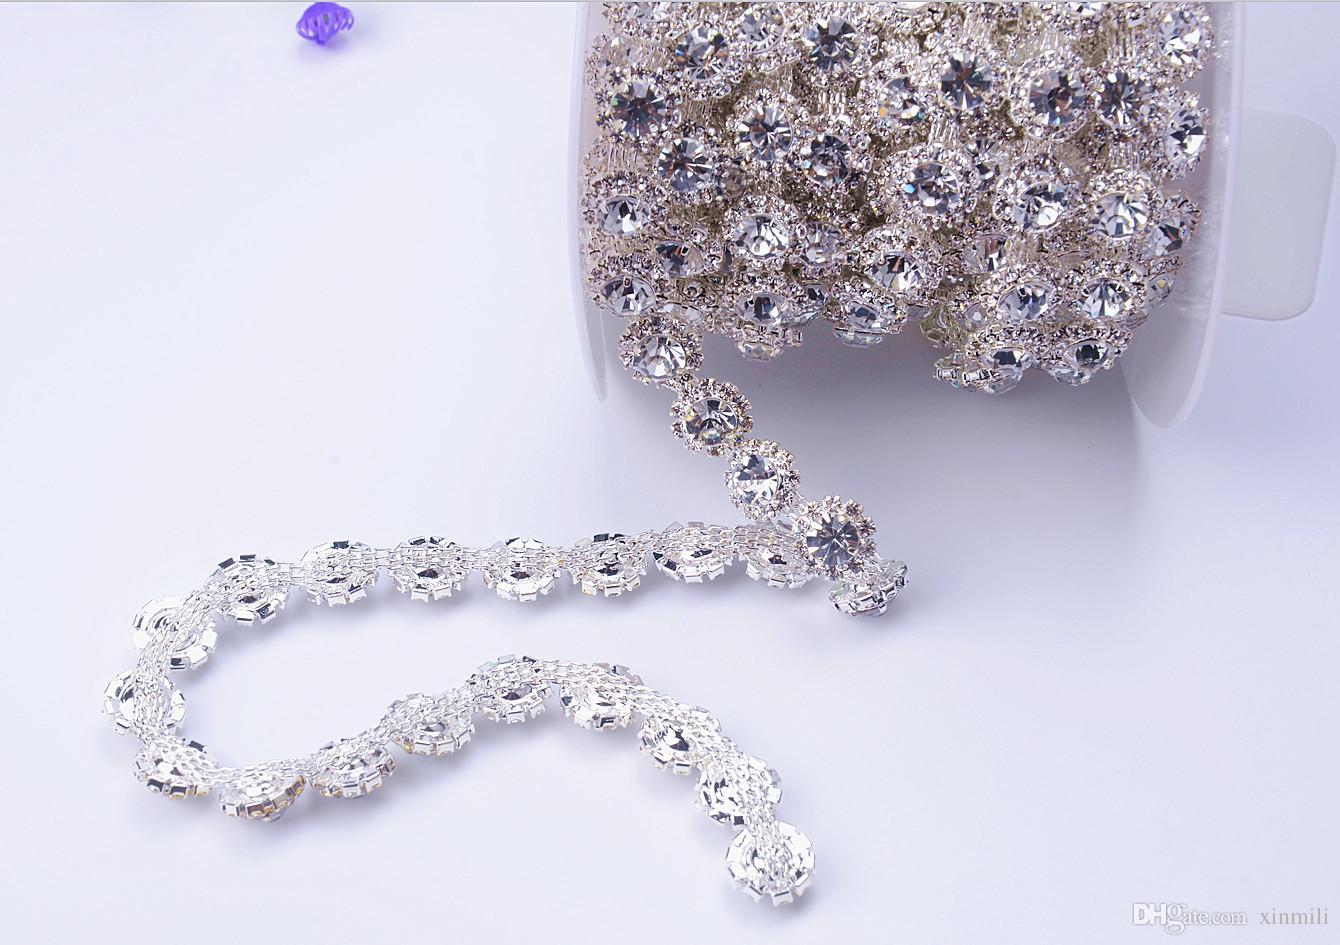 Free shippment new 1yardsclear strass crystal rhinestone 1cm width silver tone round chain fancy costume applique trim sewing